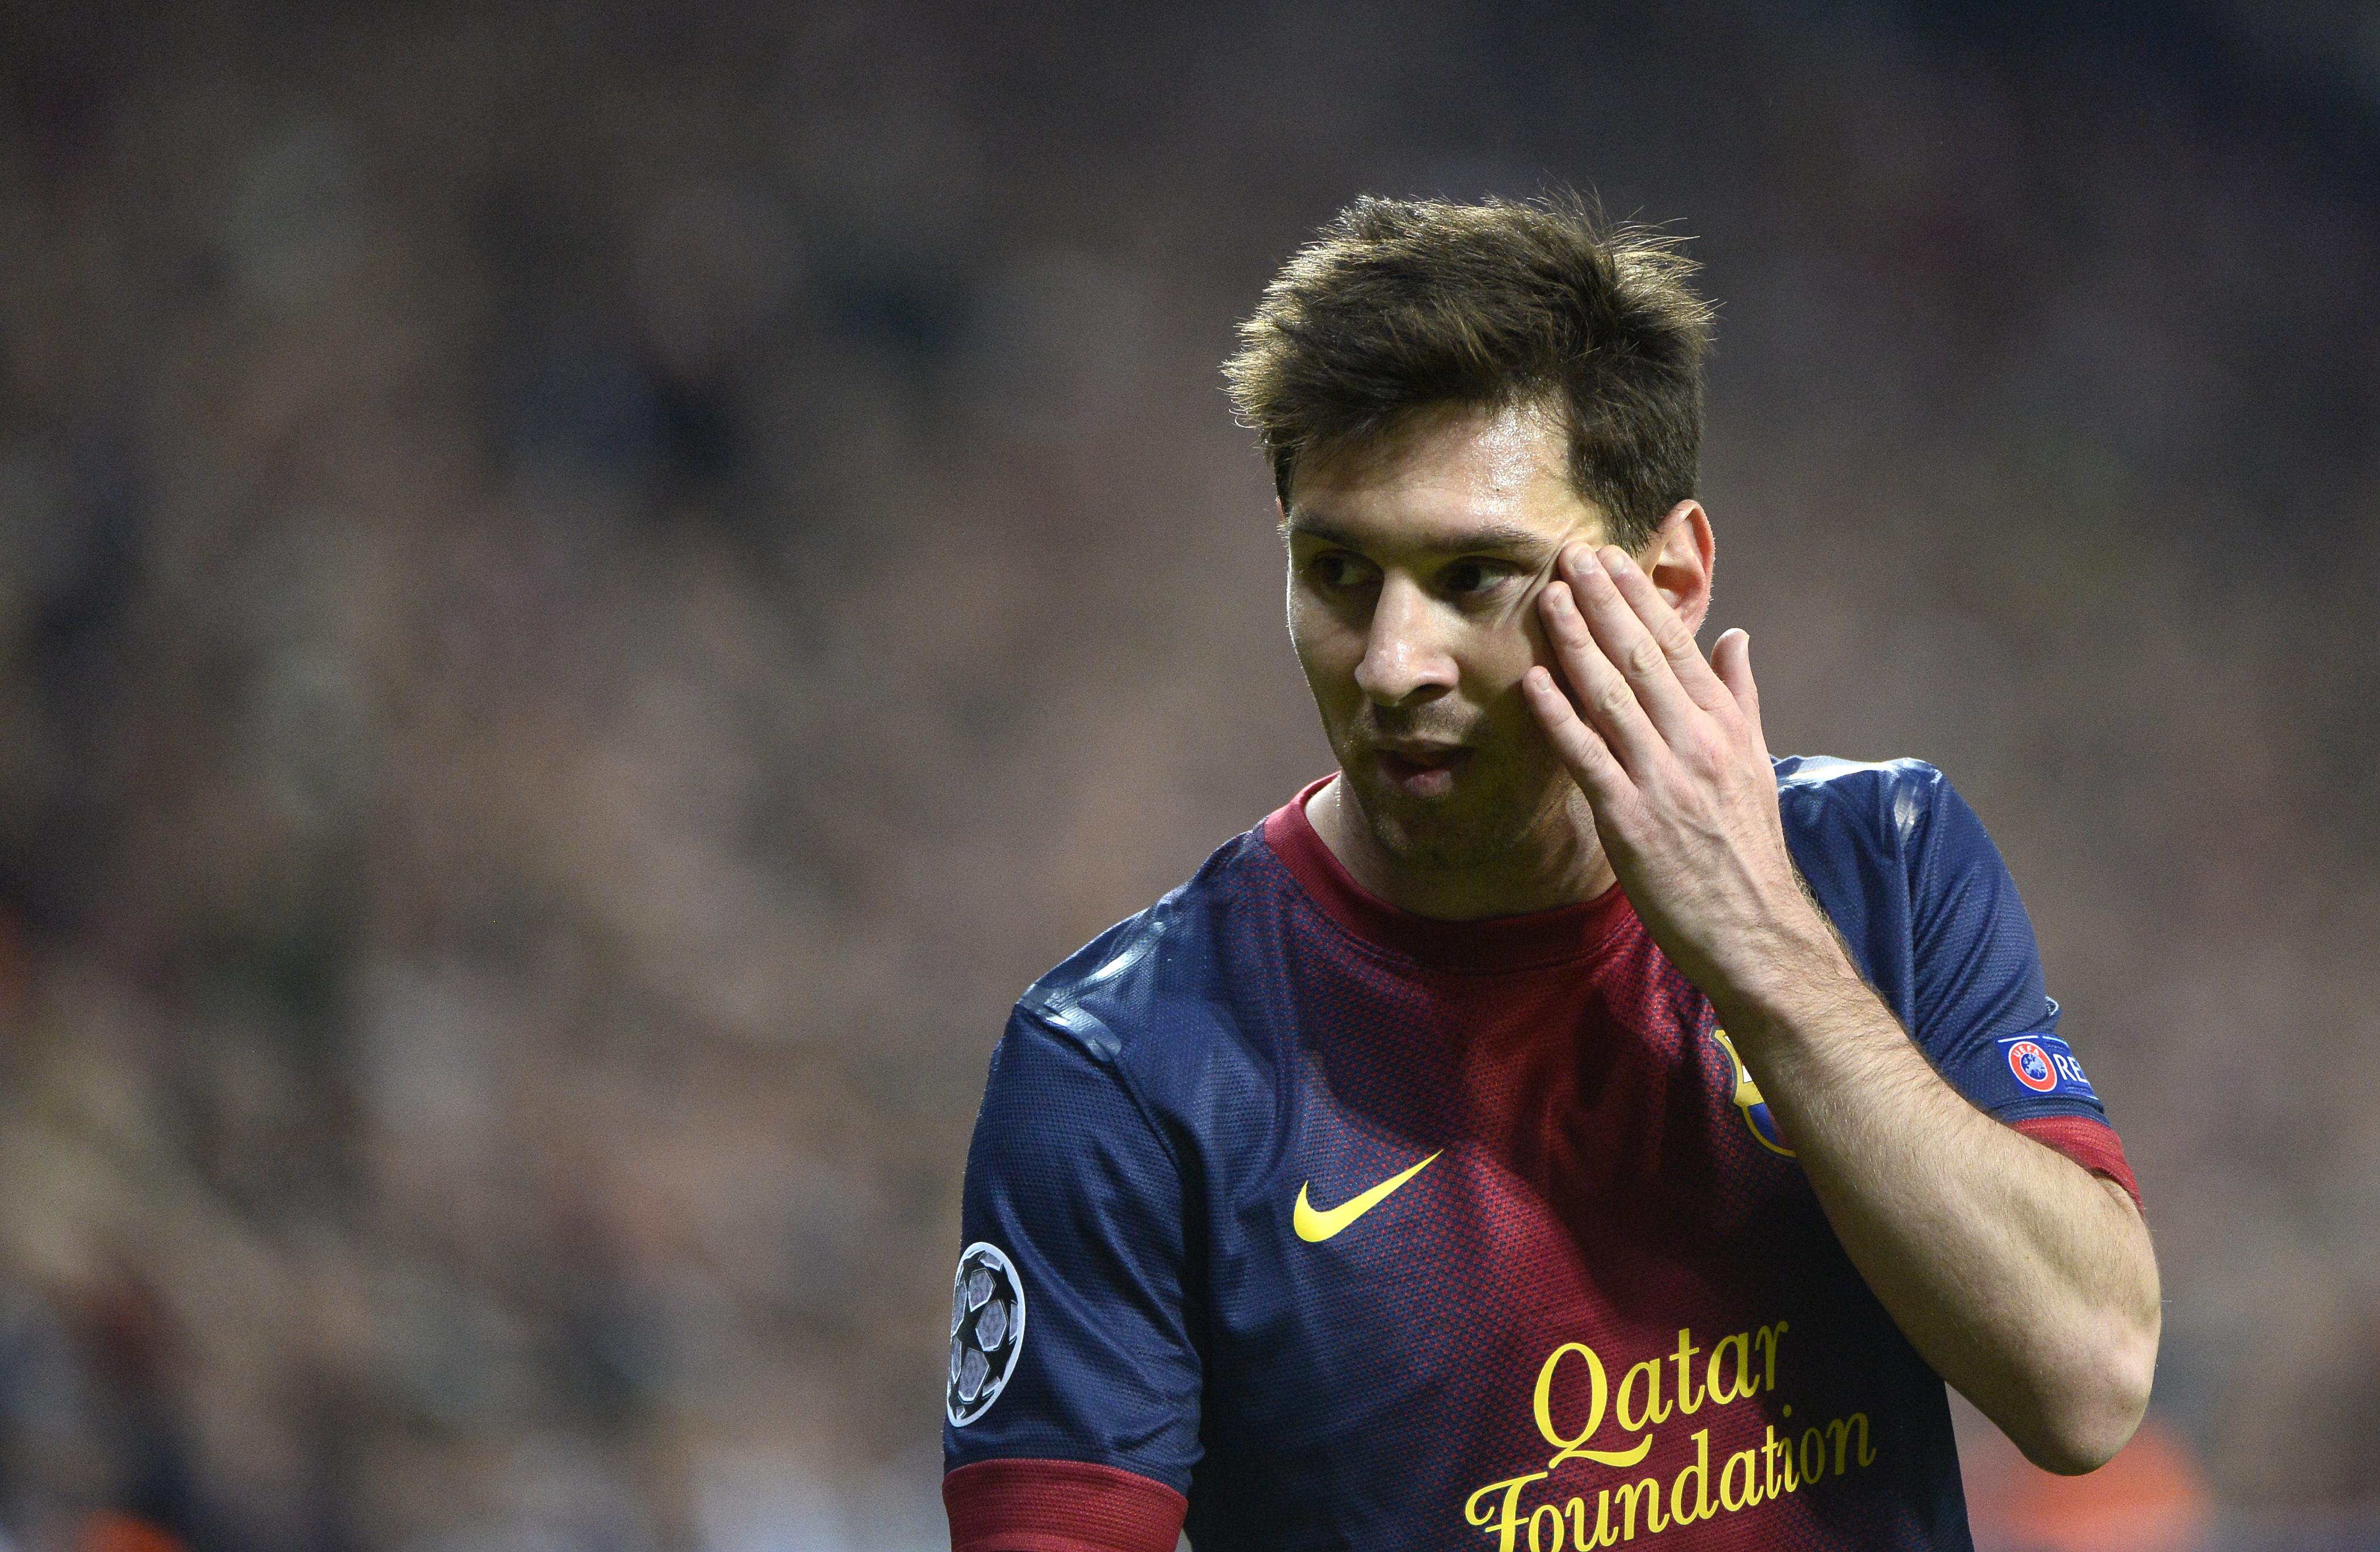 Download Messi Hd Wallpapers 4K